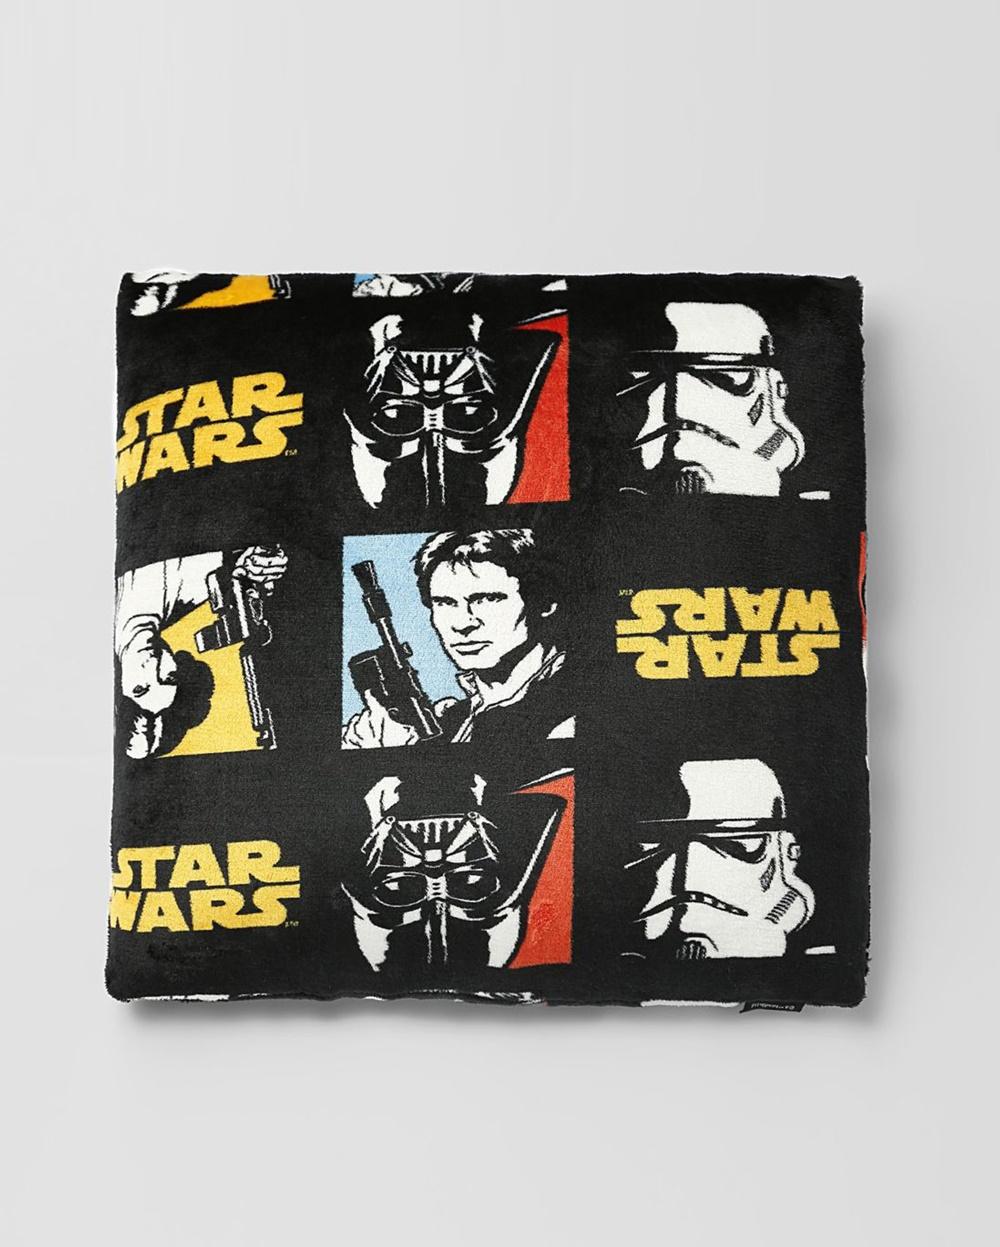 Almofada Quadrinhos Star Wars 55 x 55 cm R$ 39,90